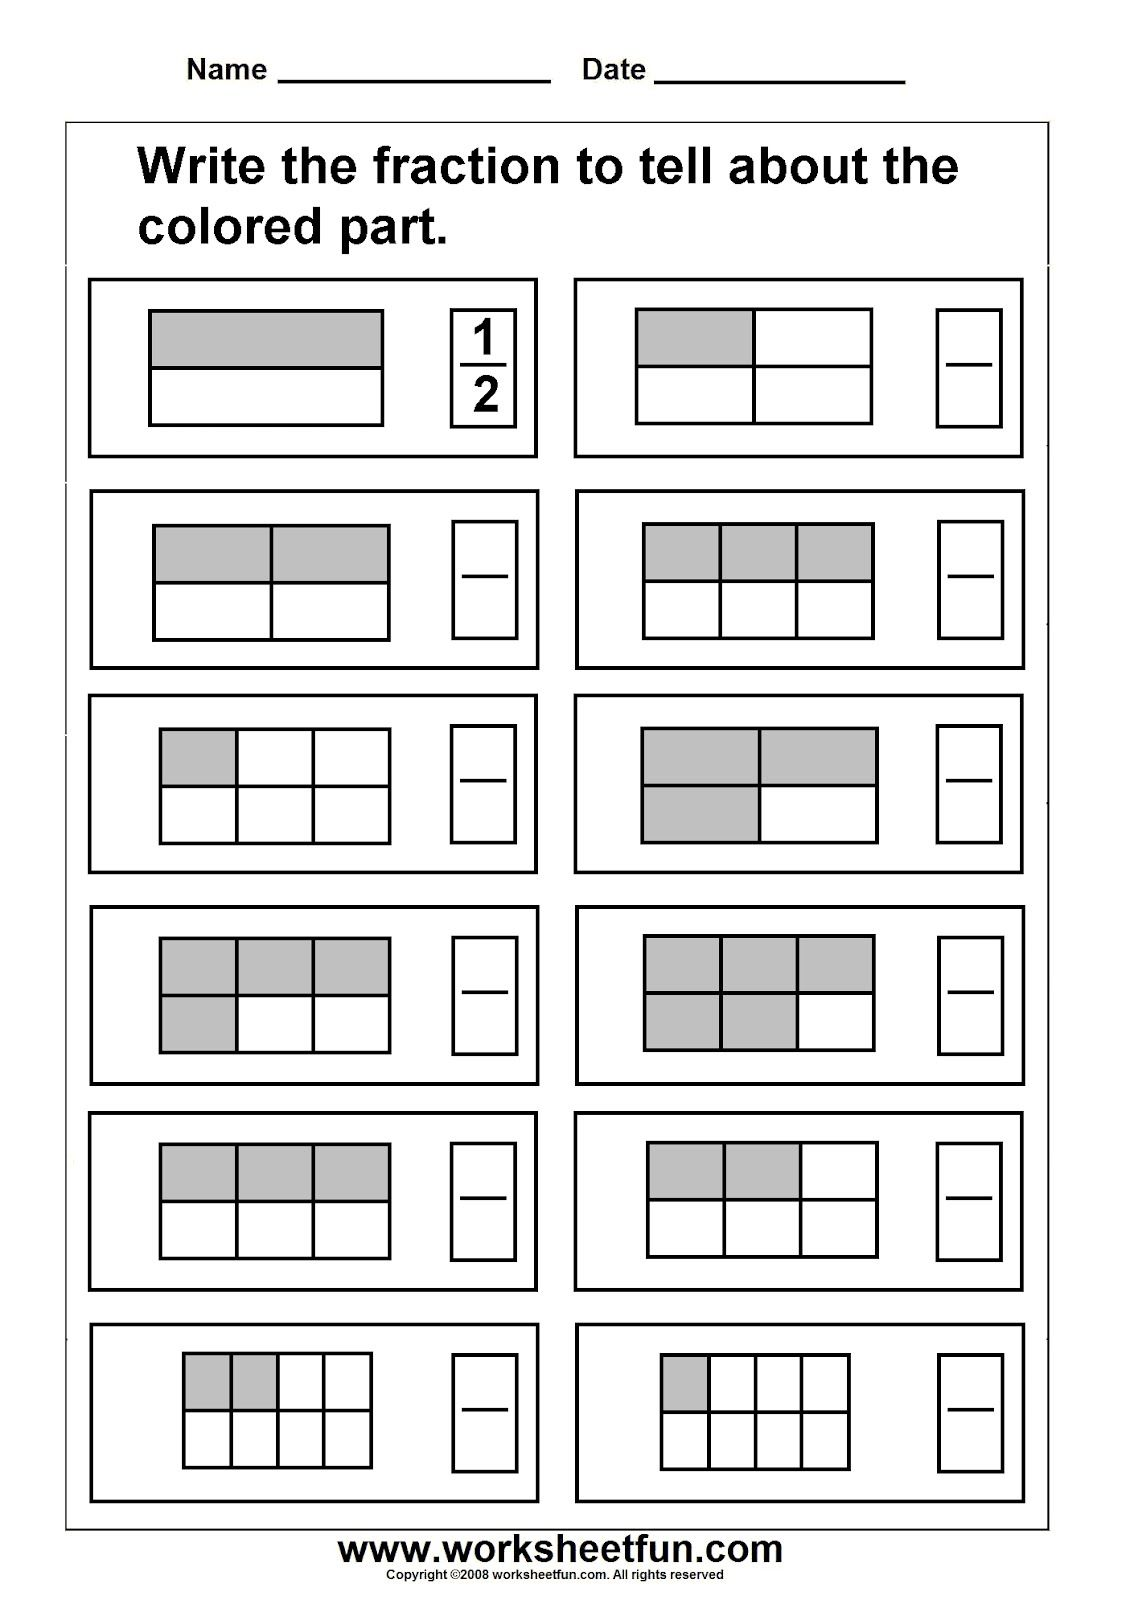 Third Grade Fraction Worksheets Fractions Worksheet 1 2 3 4